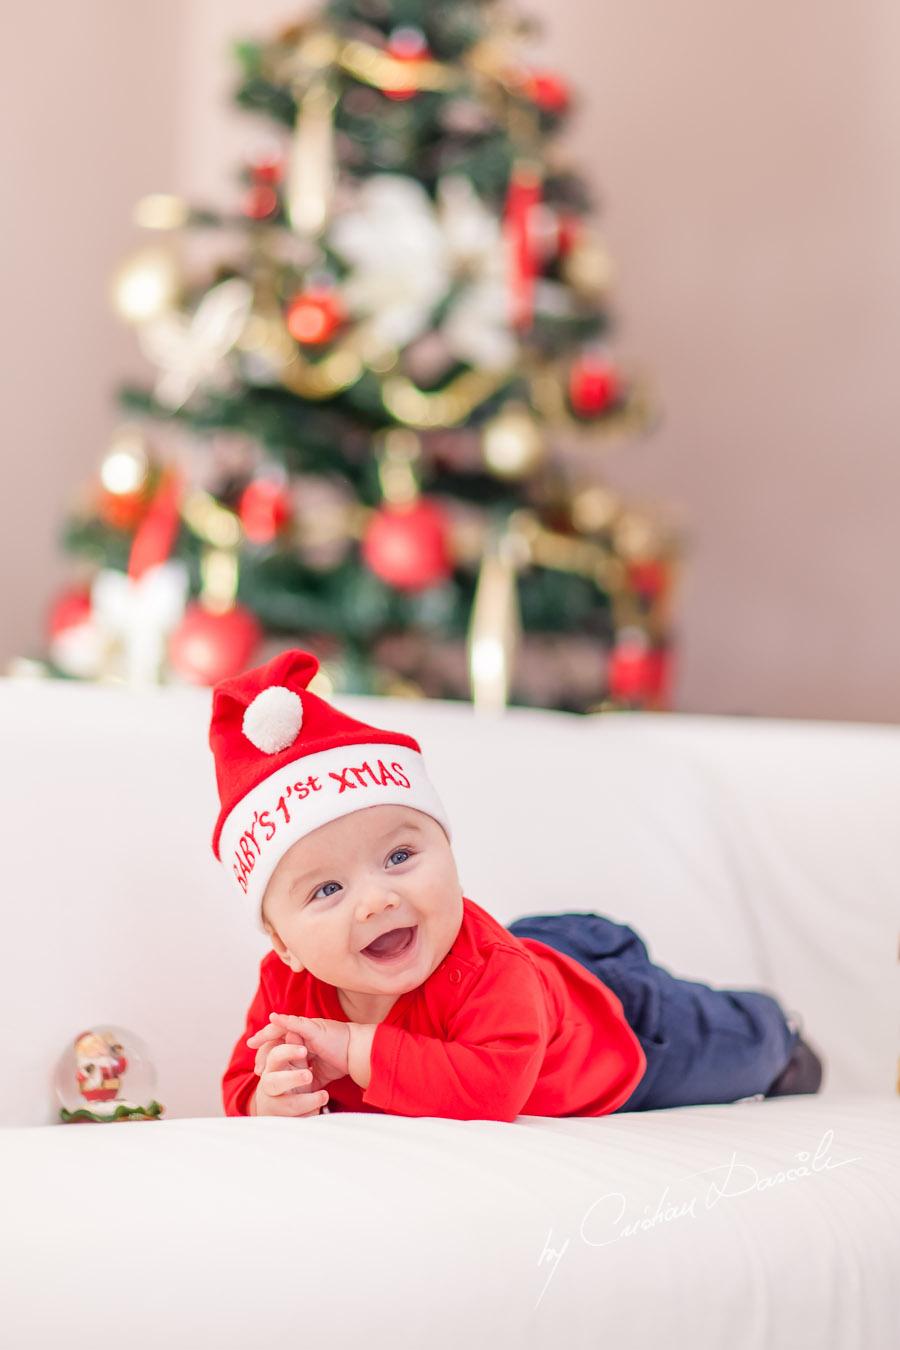 Christmas Family Photos in Cyprus. Photographer: Cristian Dascalu